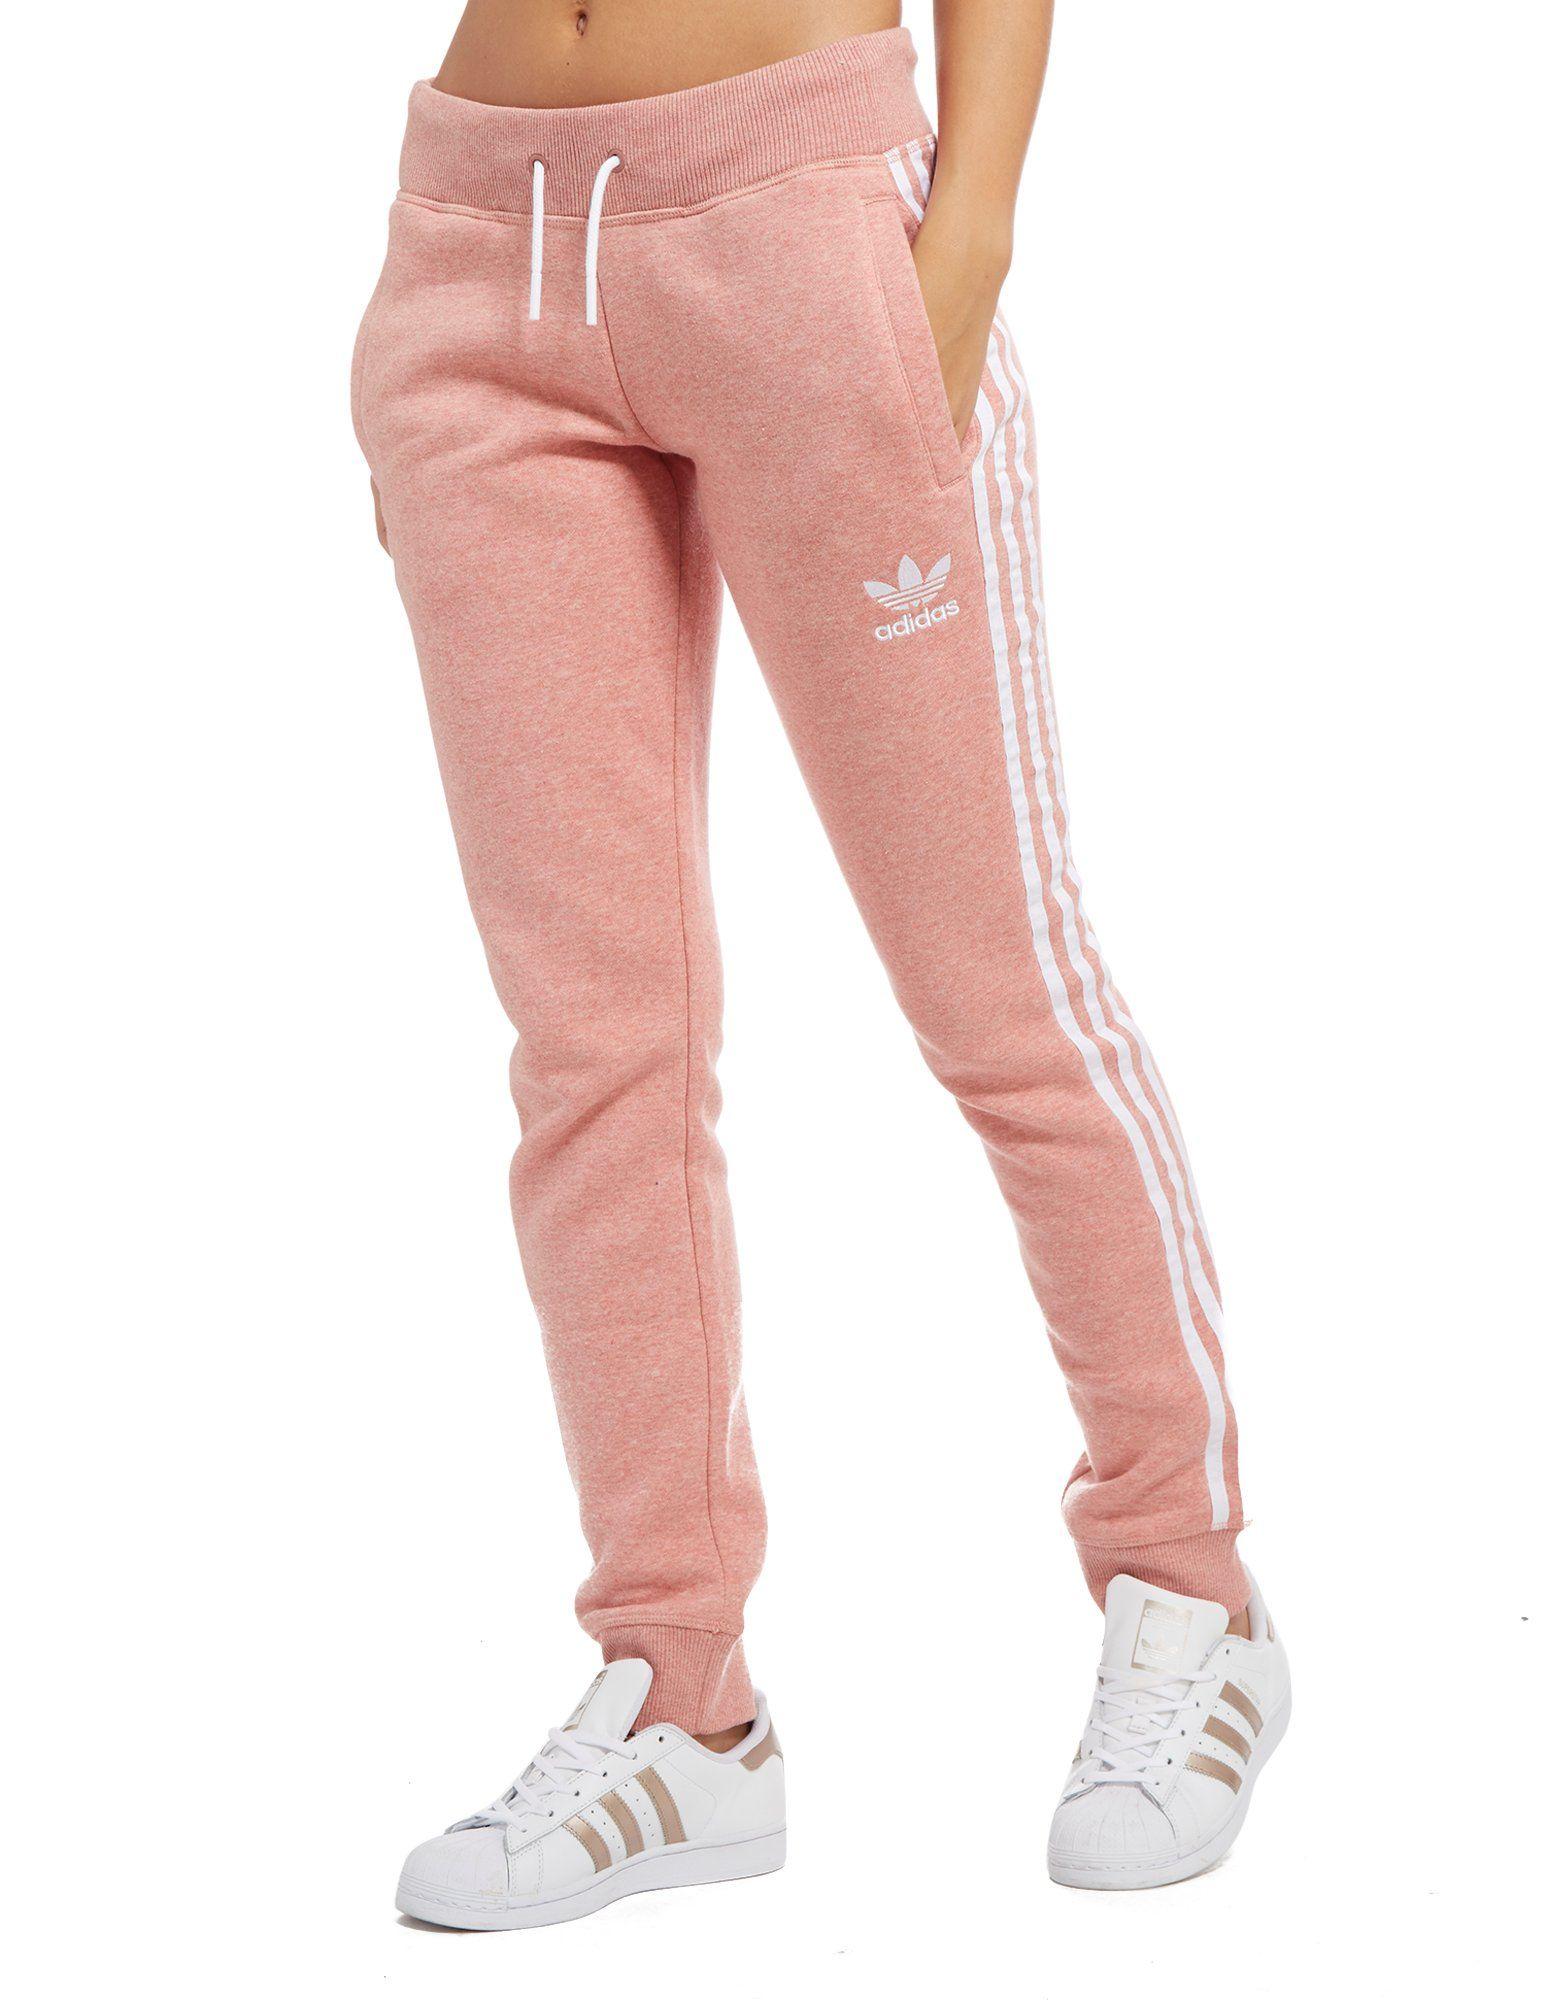 aa23ae26a1 adidas Originals California Track Pants   JD Sports